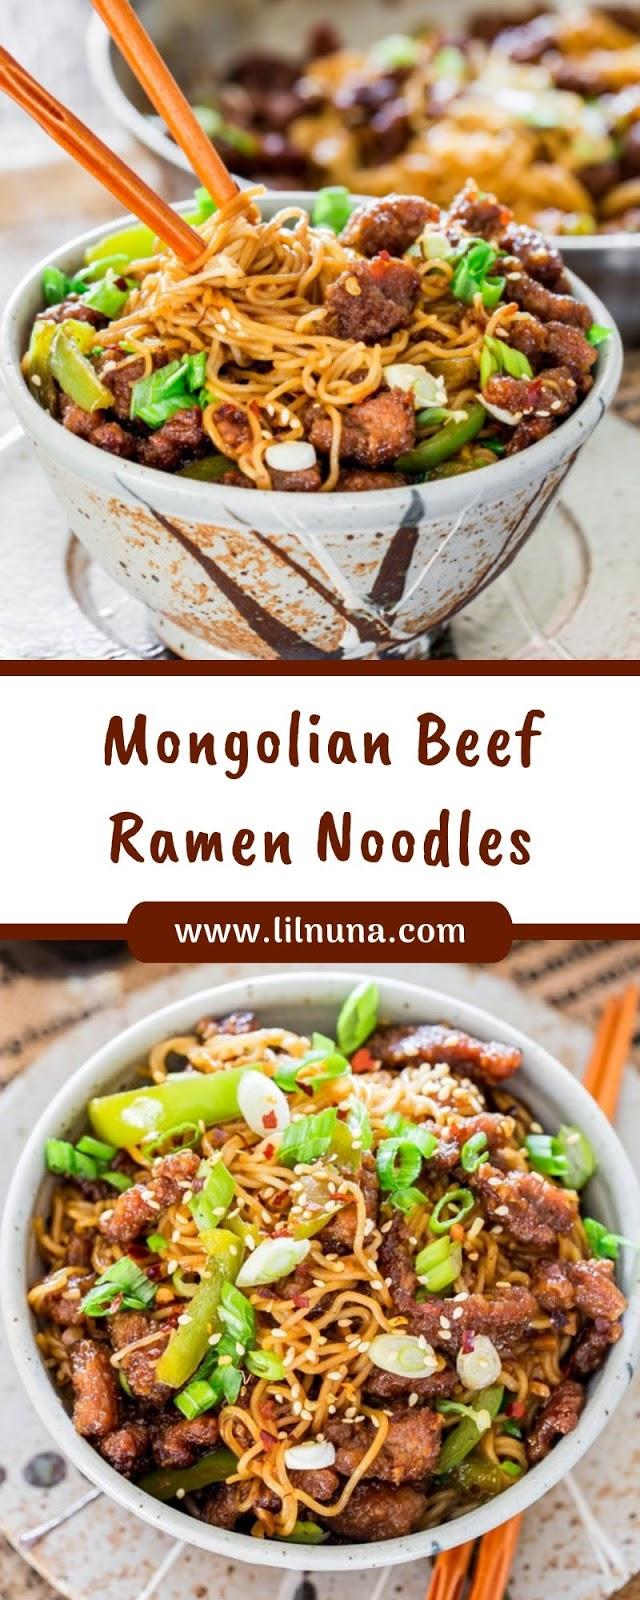 Mongolian Beef Ramen Noodles